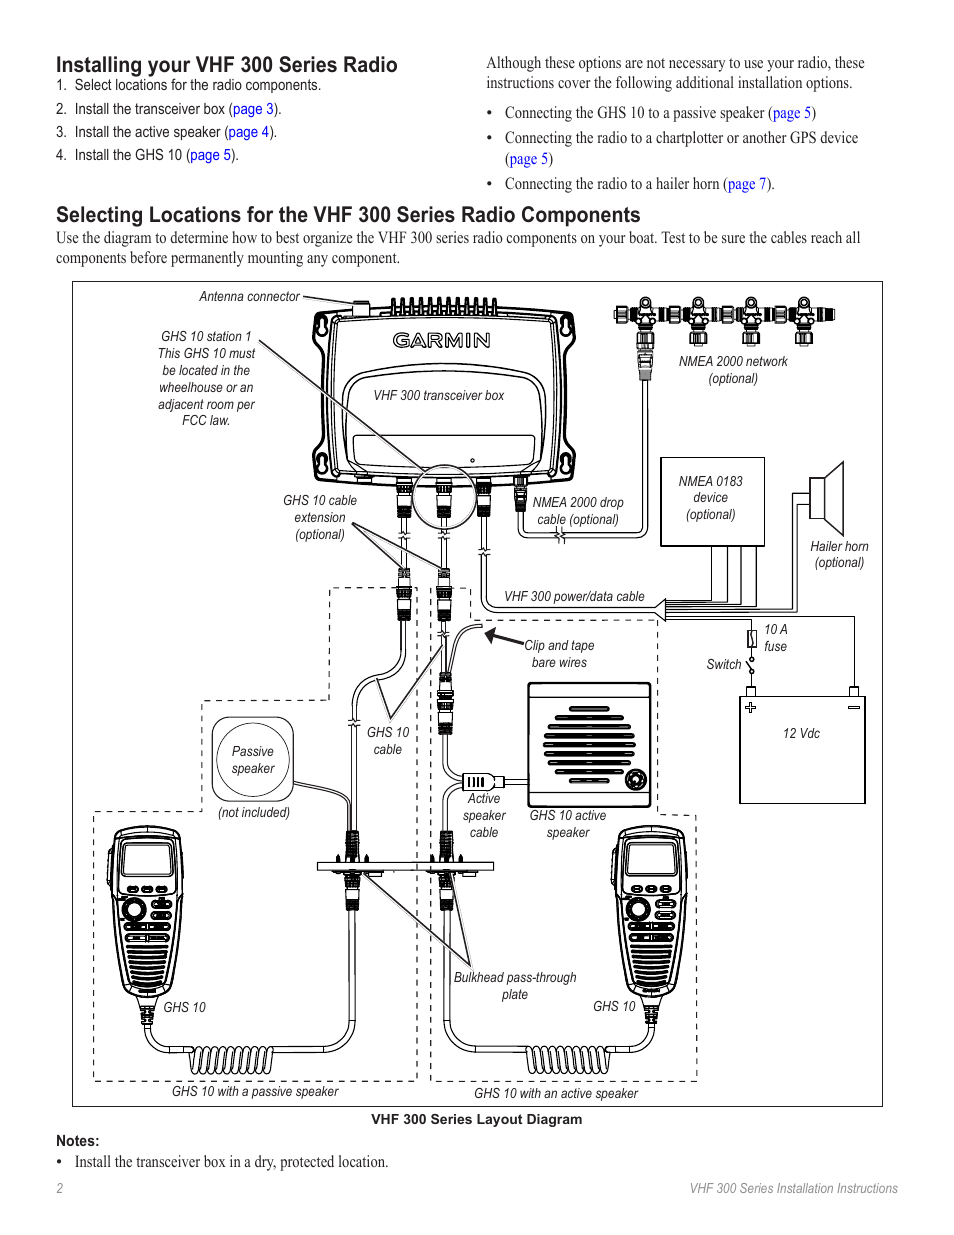 medium resolution of installing your vhf 300 series radio garmin vhf ghs 10i user manual page 2 12